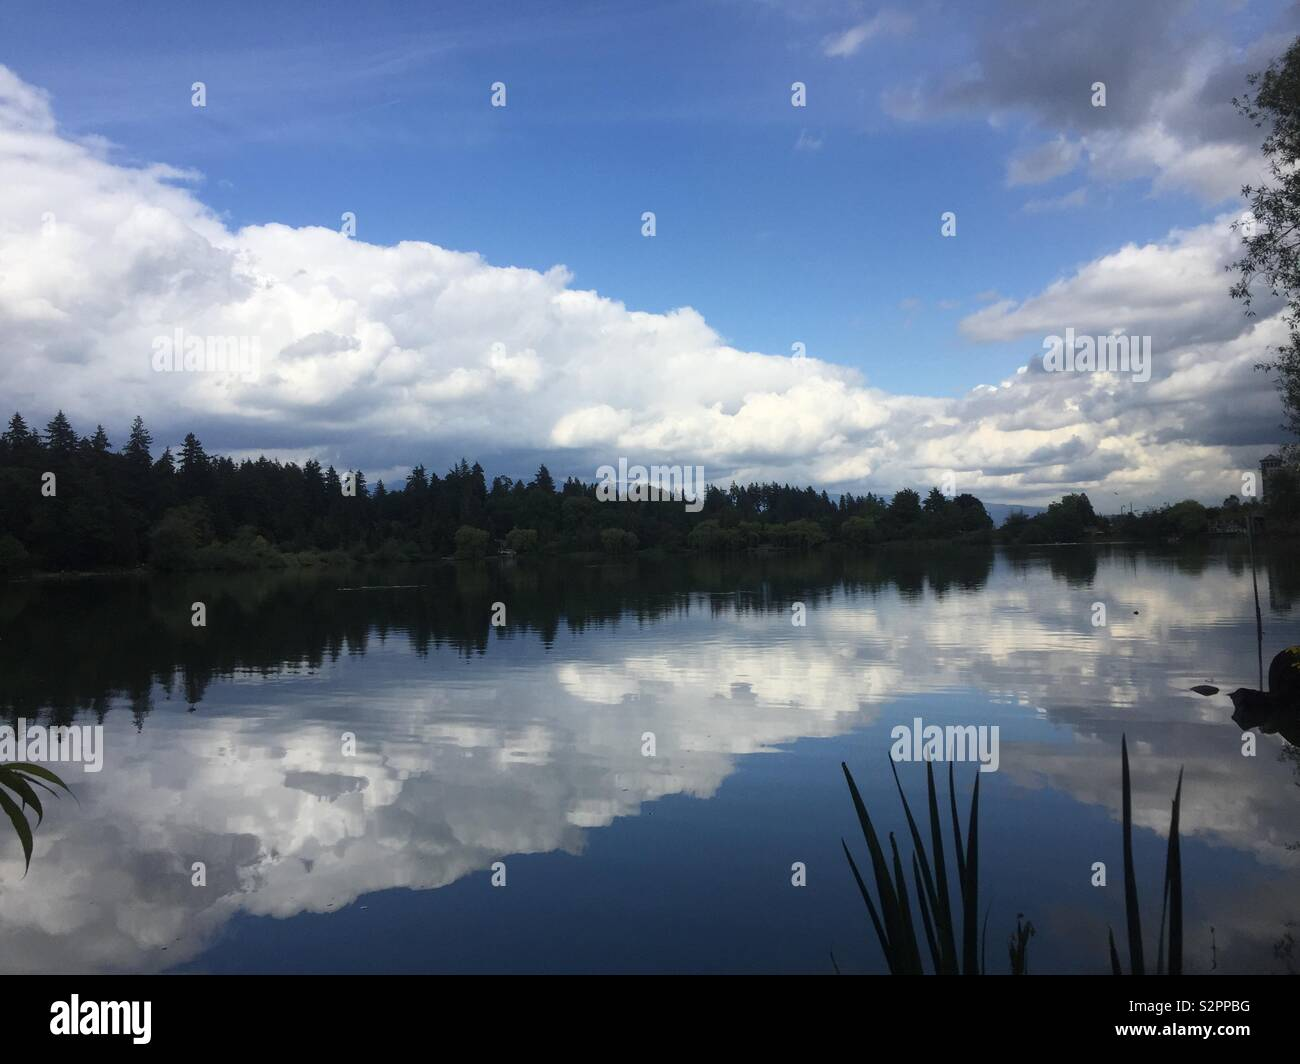 Verloren largoon im Stanley Park, Vancouver, Kanada Stockbild